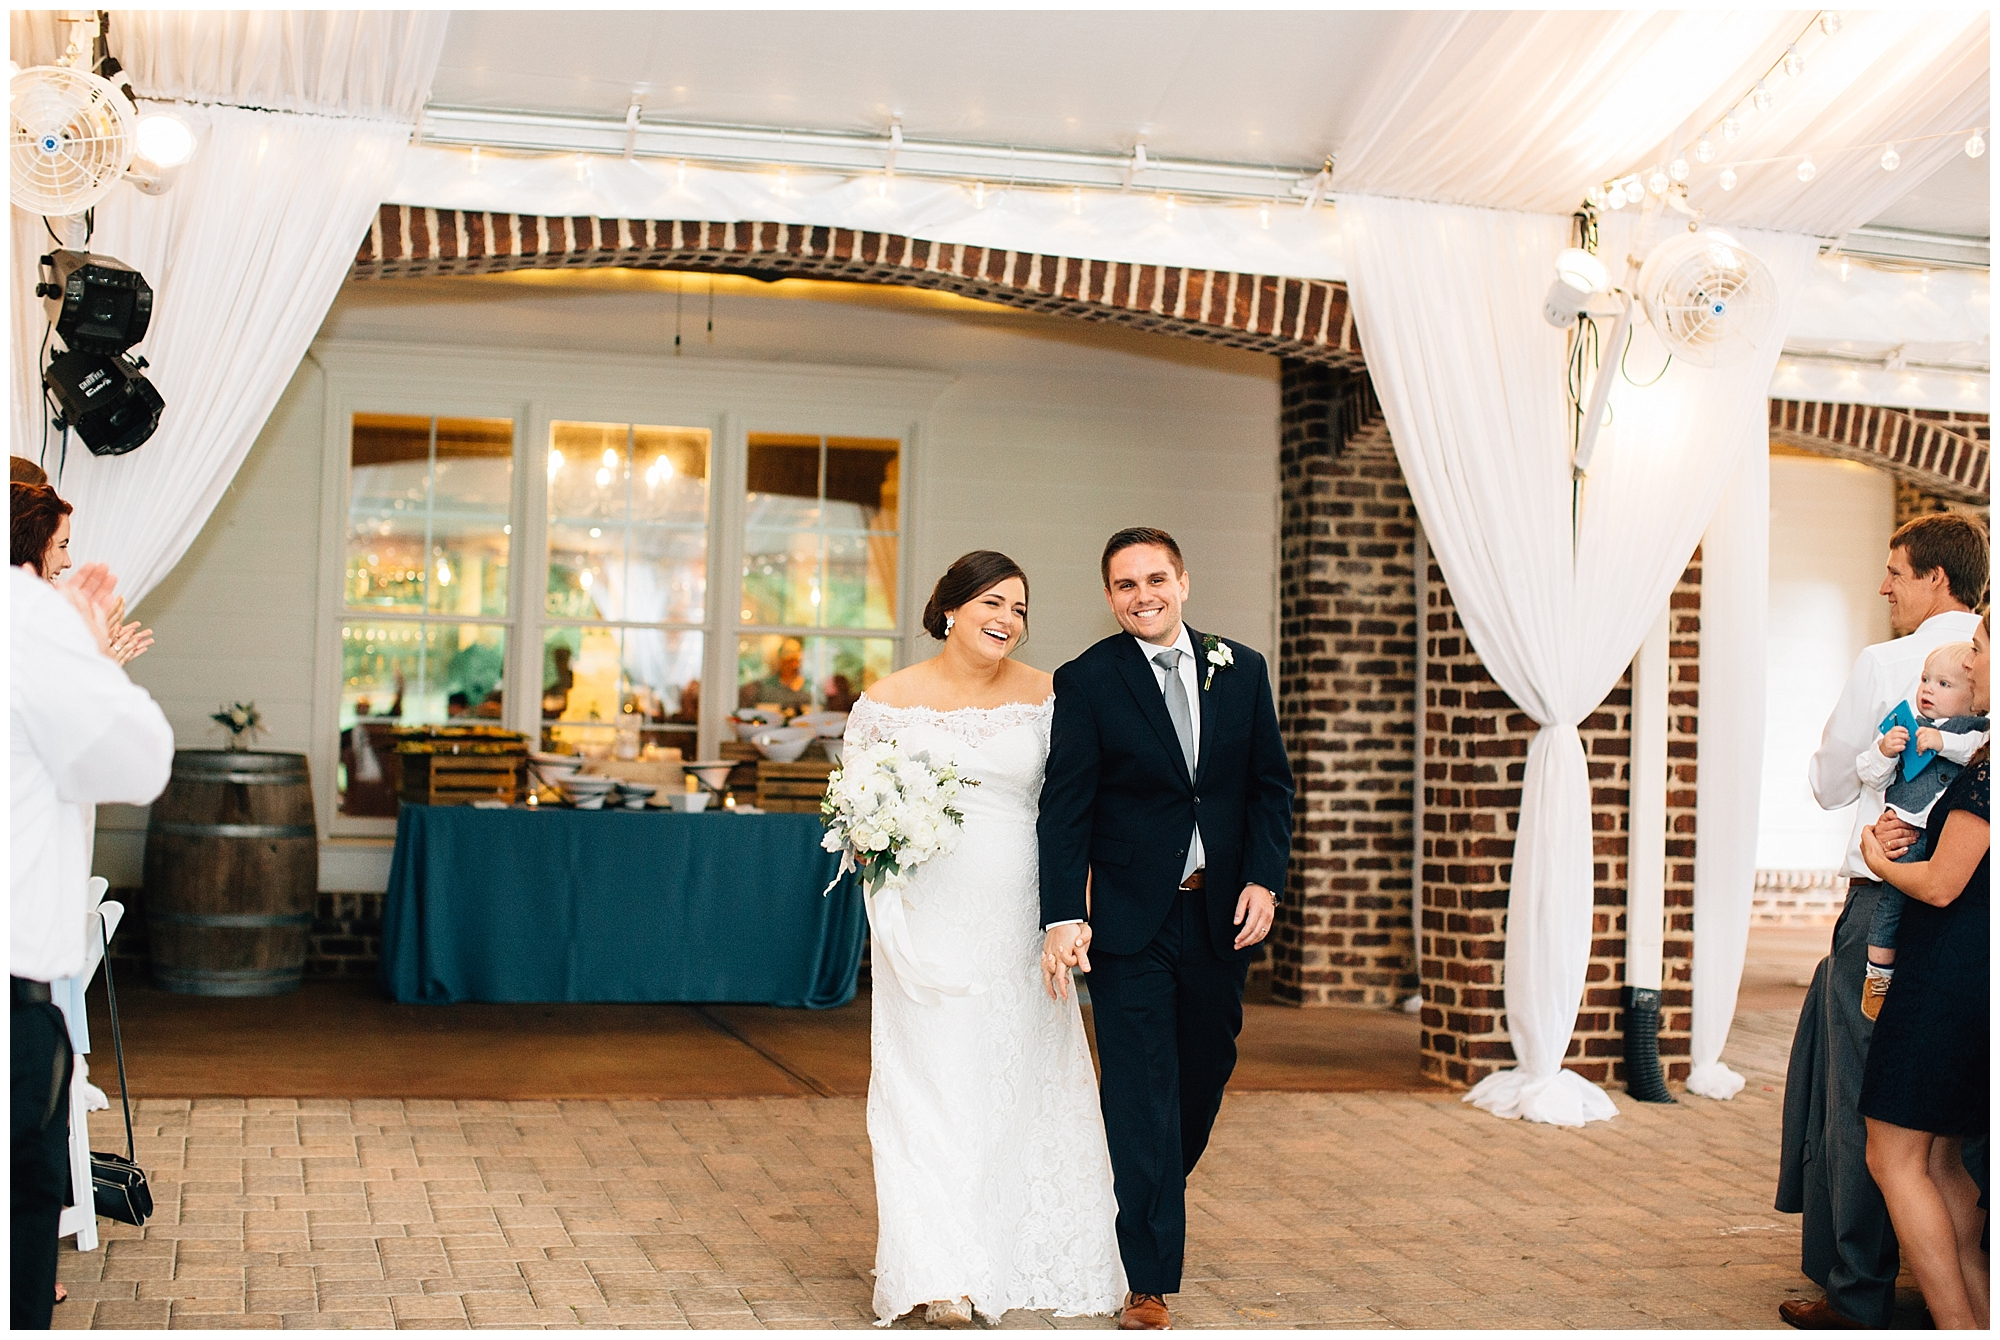 Oaks-at-salem-wedding-apex-photography-89.jpg